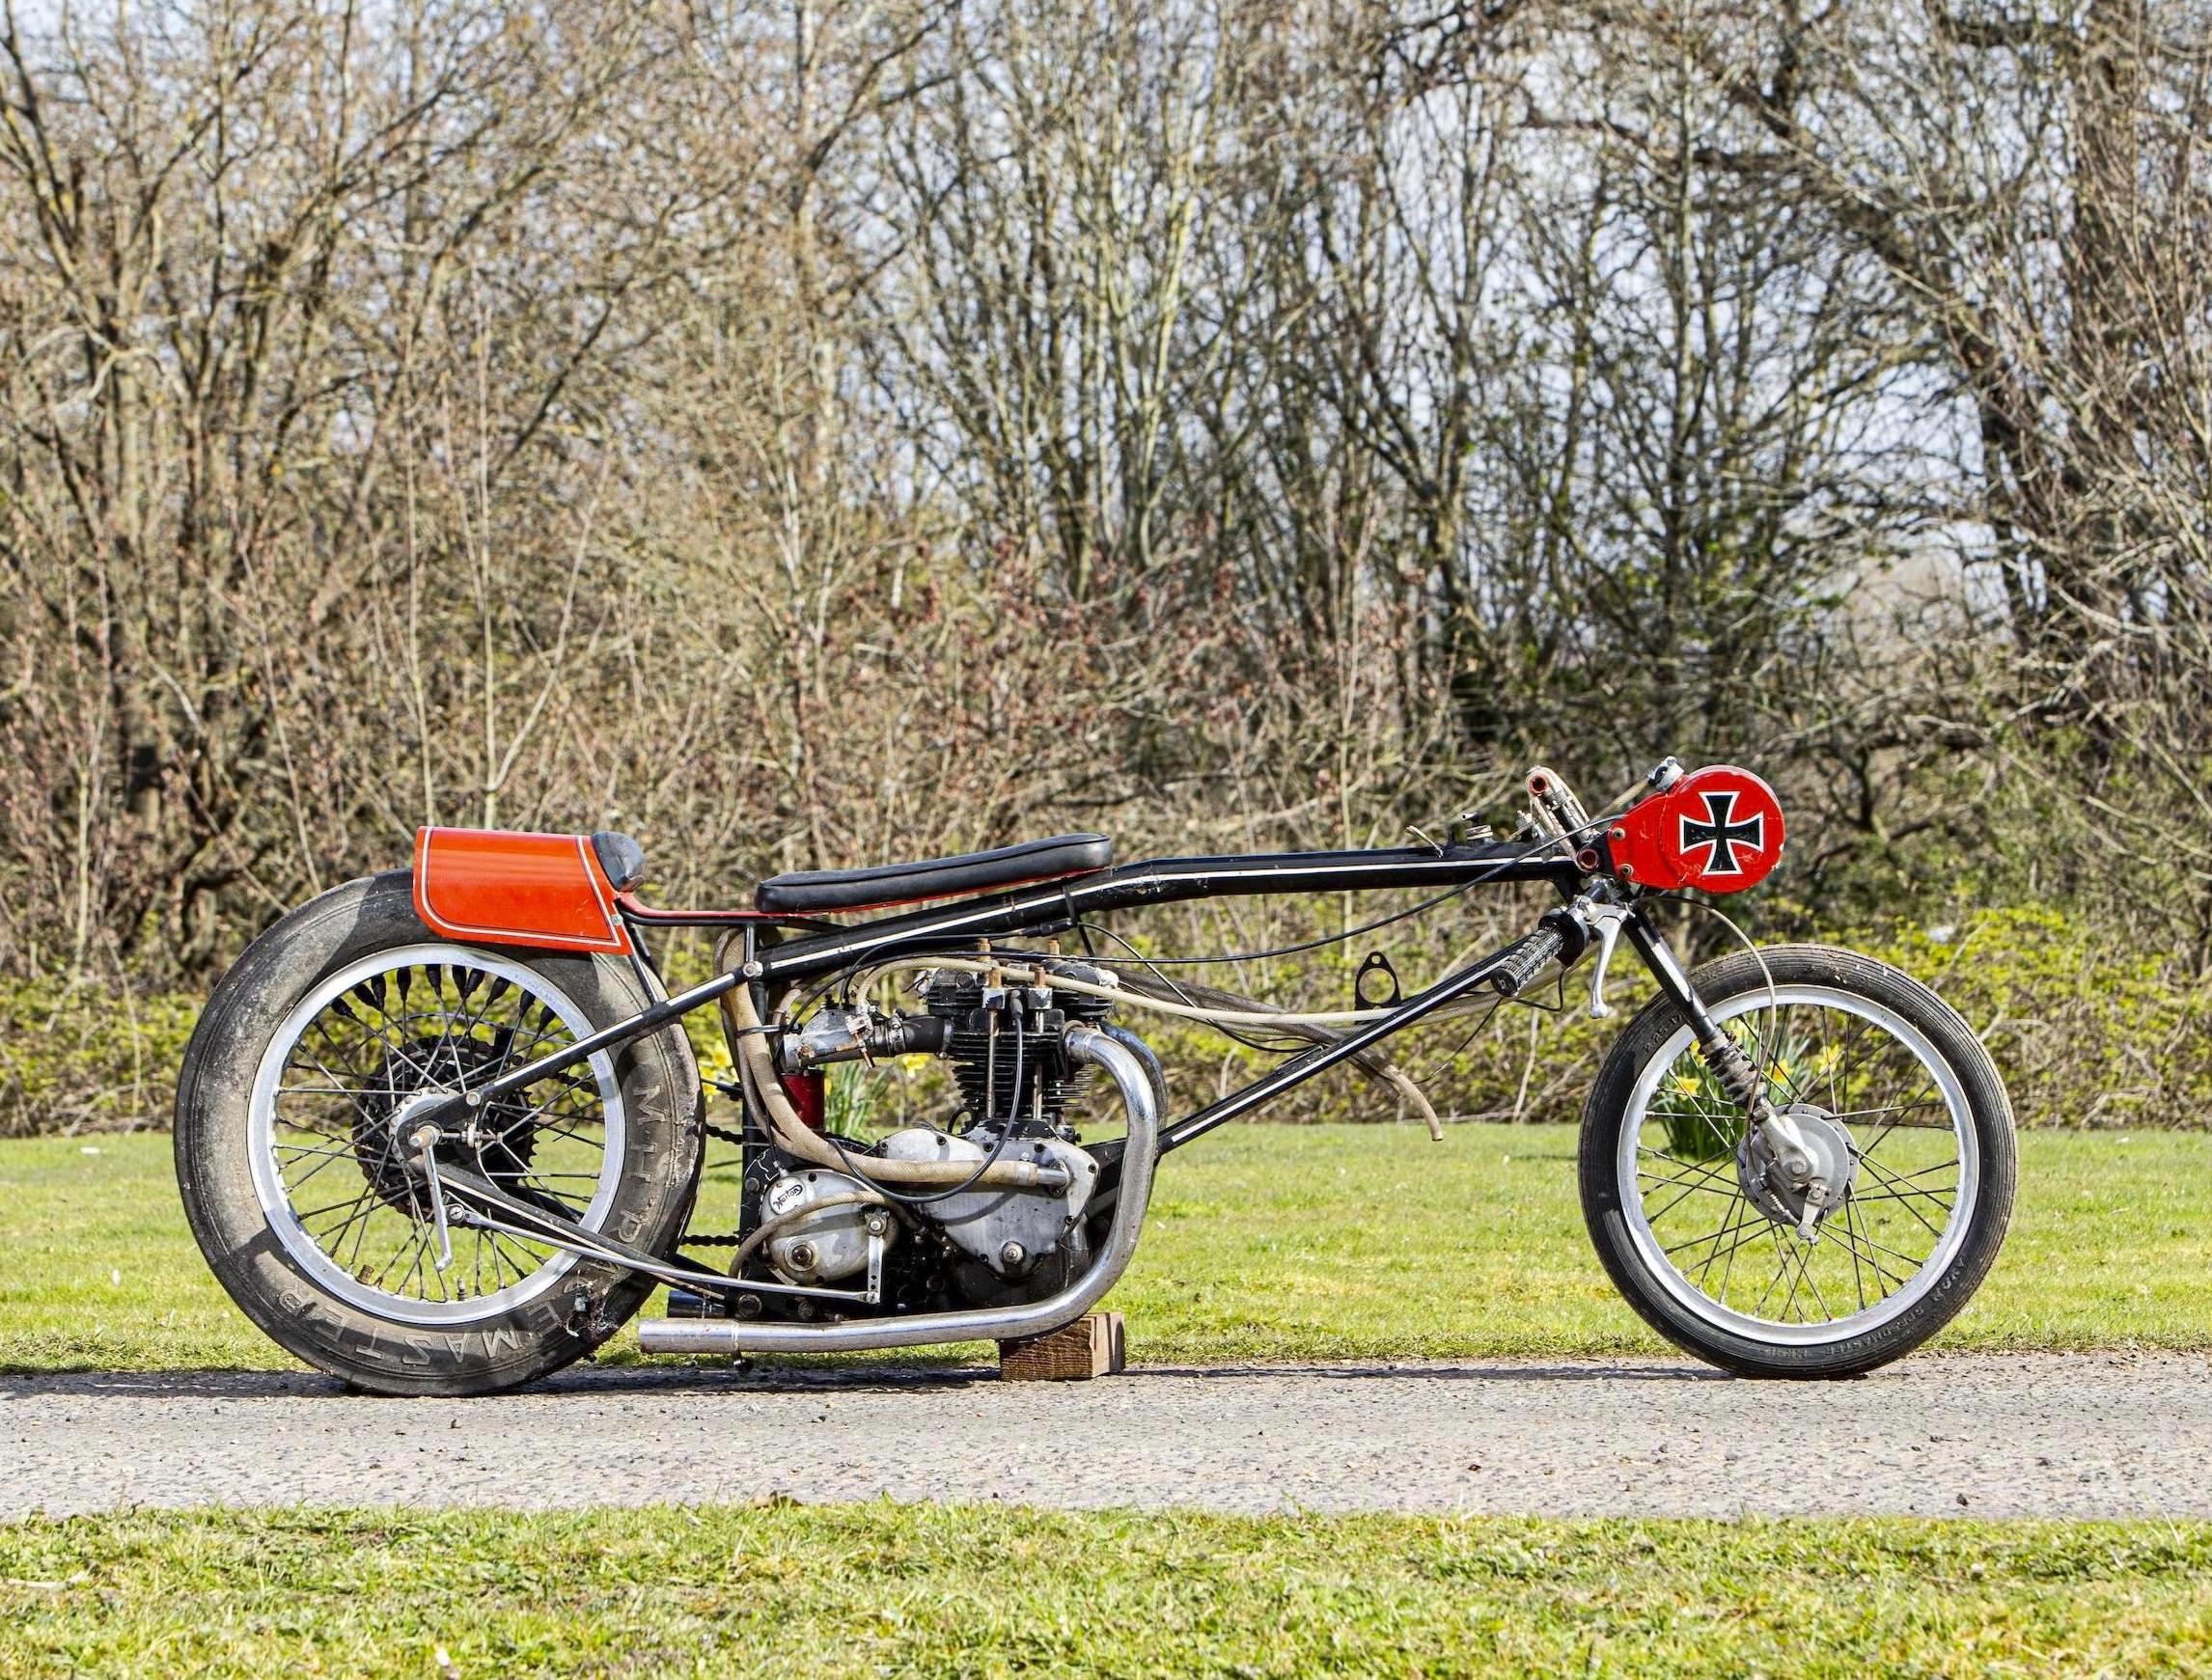 Triumph Drag Racing Bike